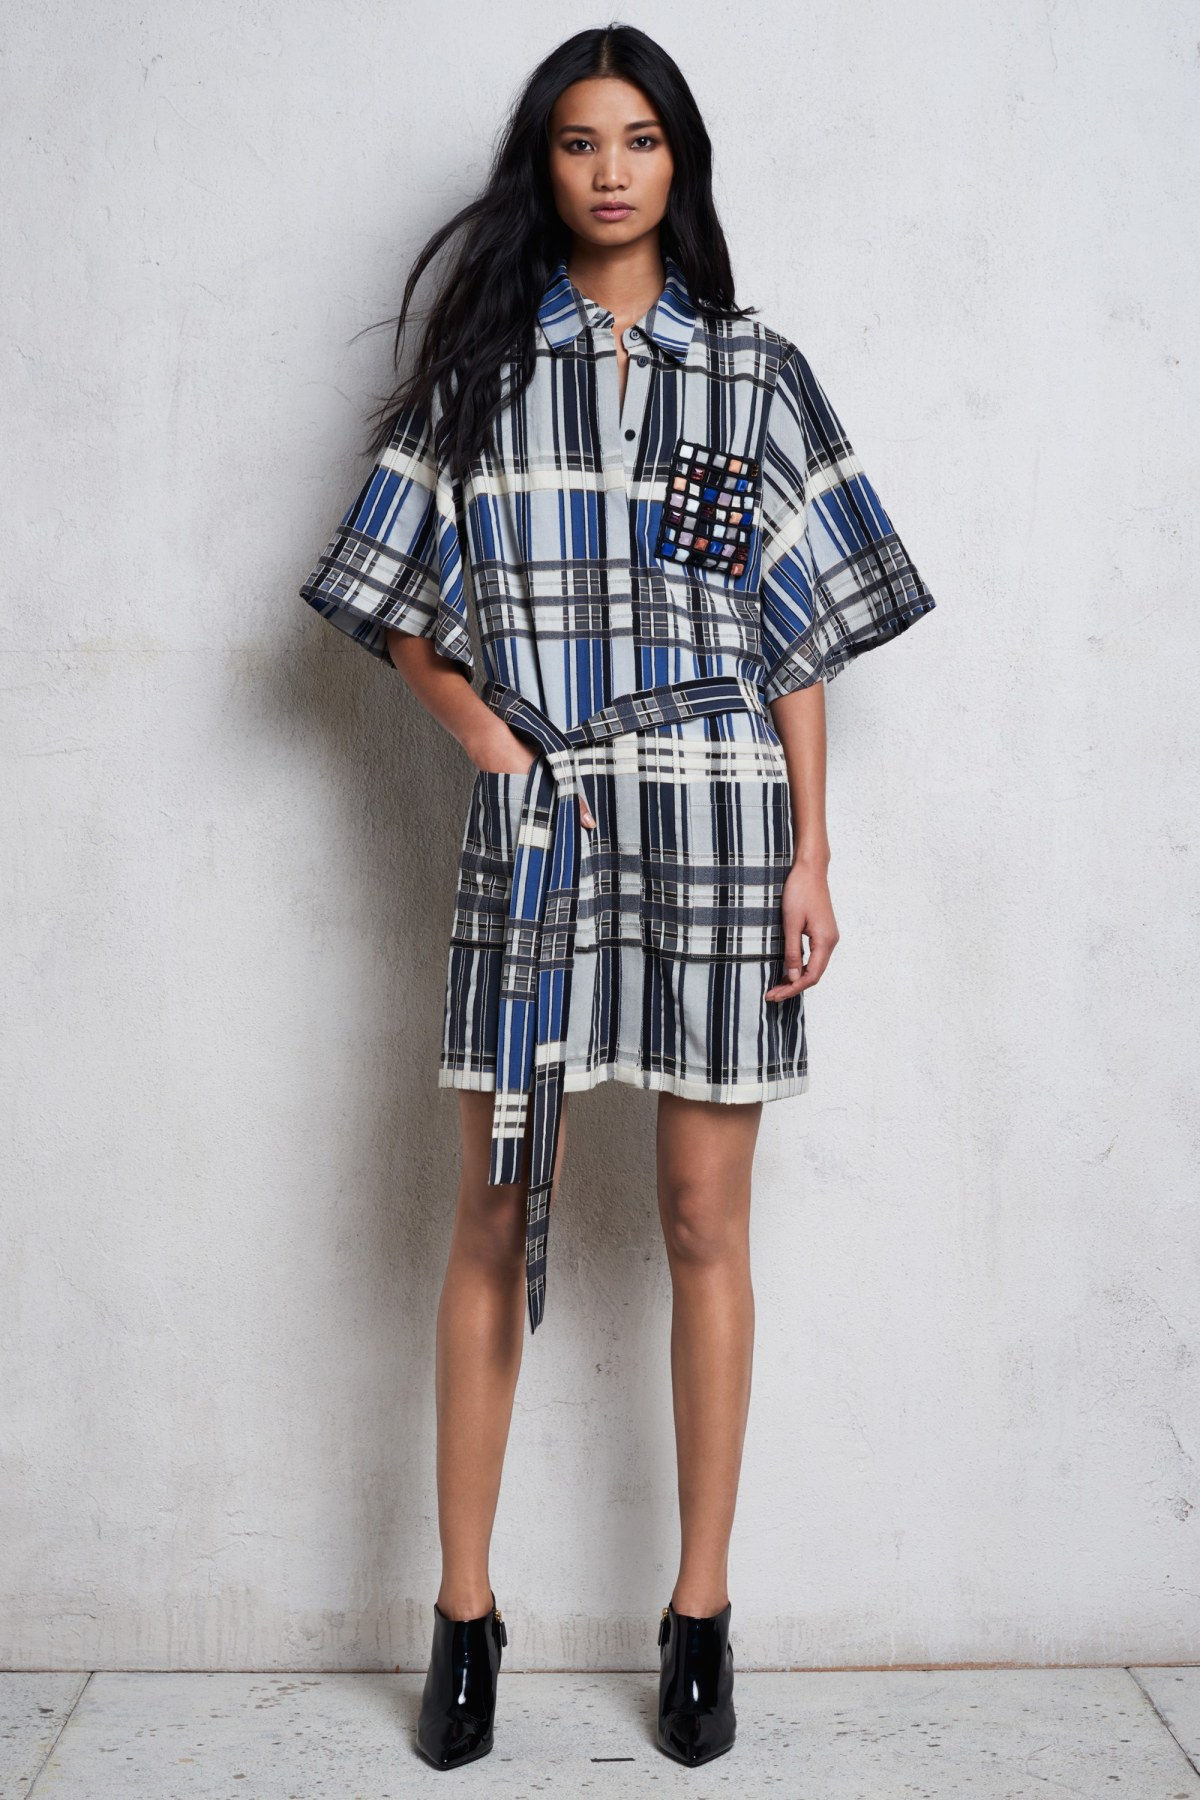 kimora-lee-simmons-pre-fall-2017-fashion-show-the-impression-06